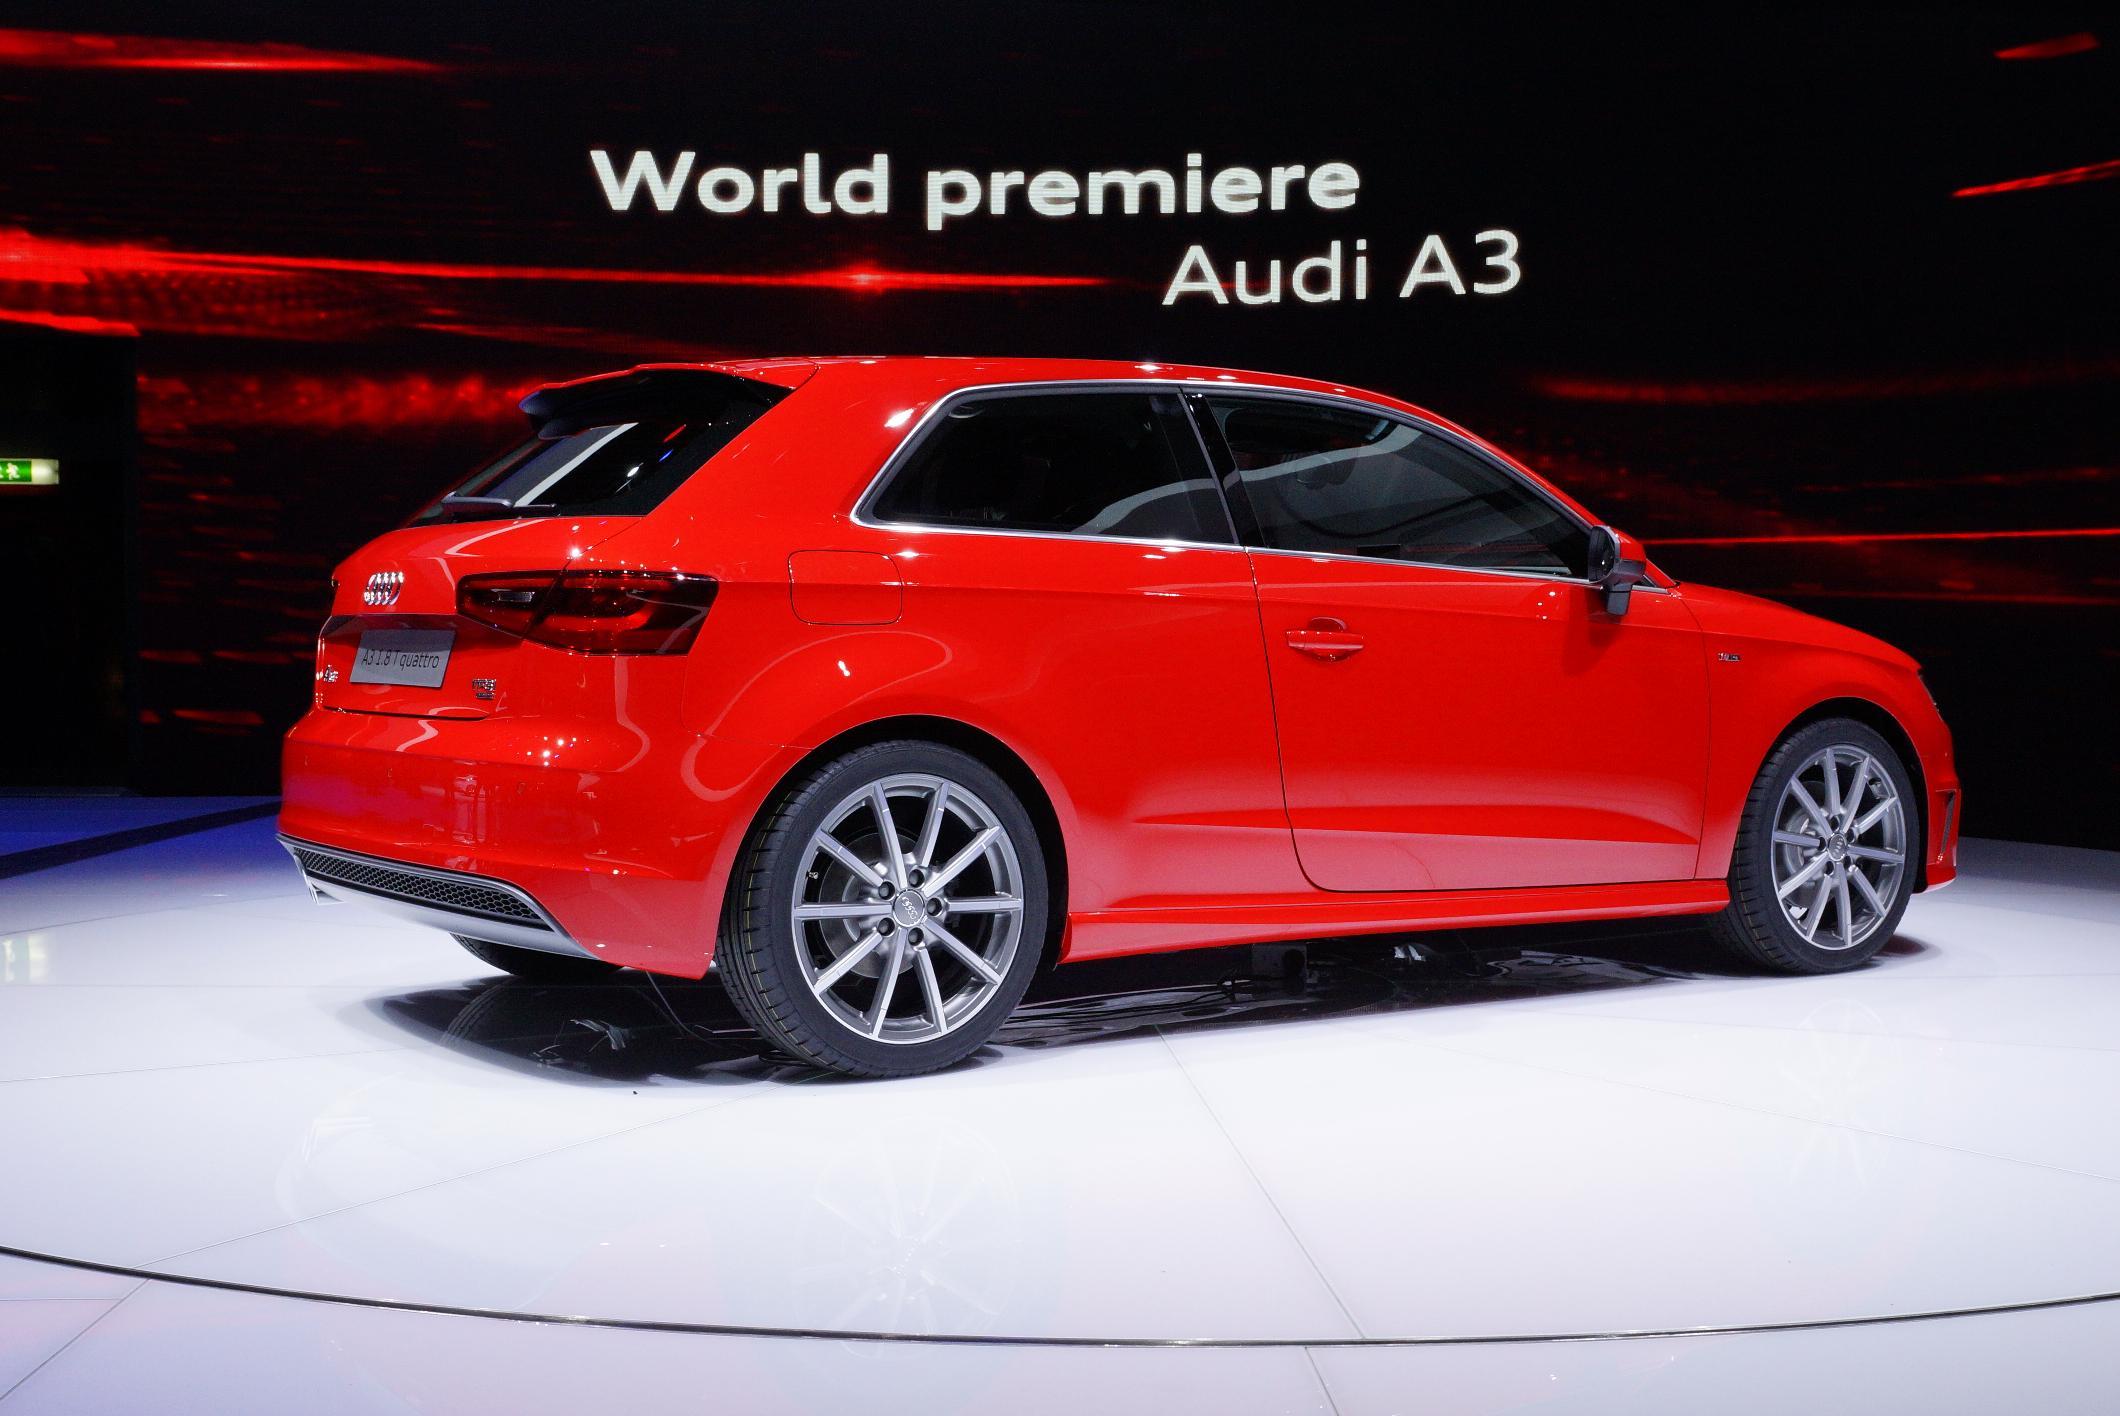 Audi A3 Geneva 2012 Side